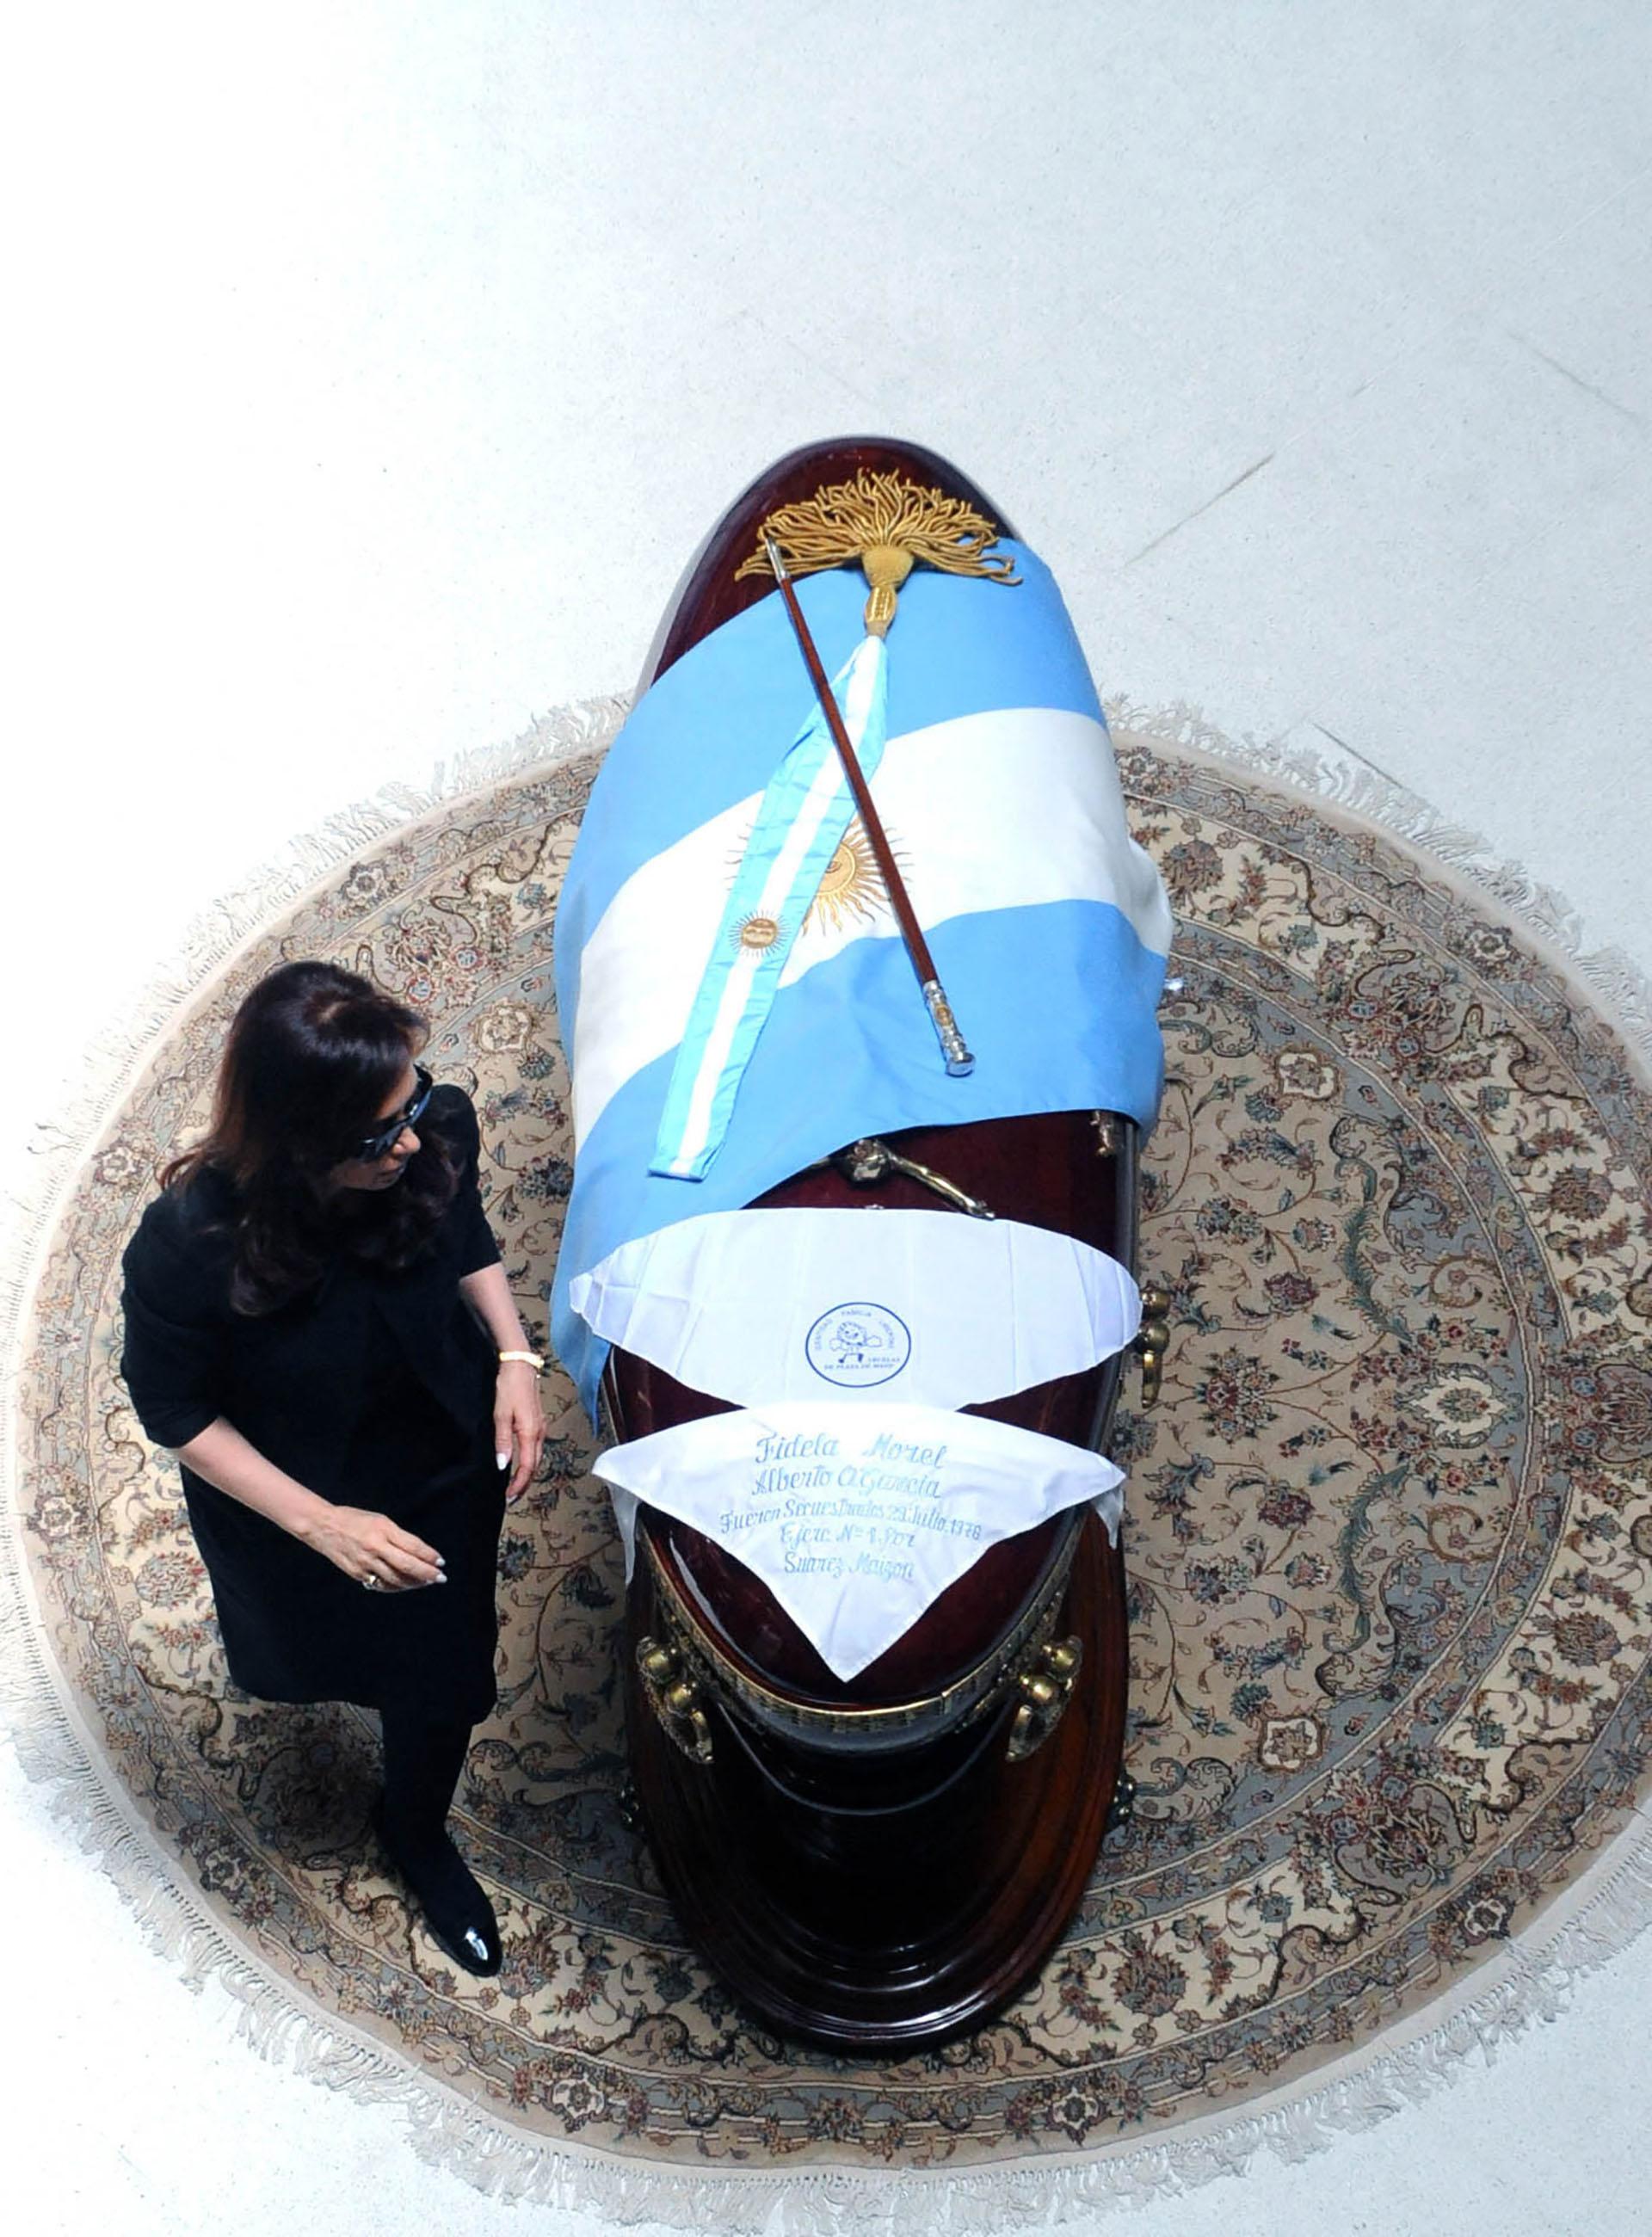 Cristina Kirchner en el velorio de Néstor Kirchner